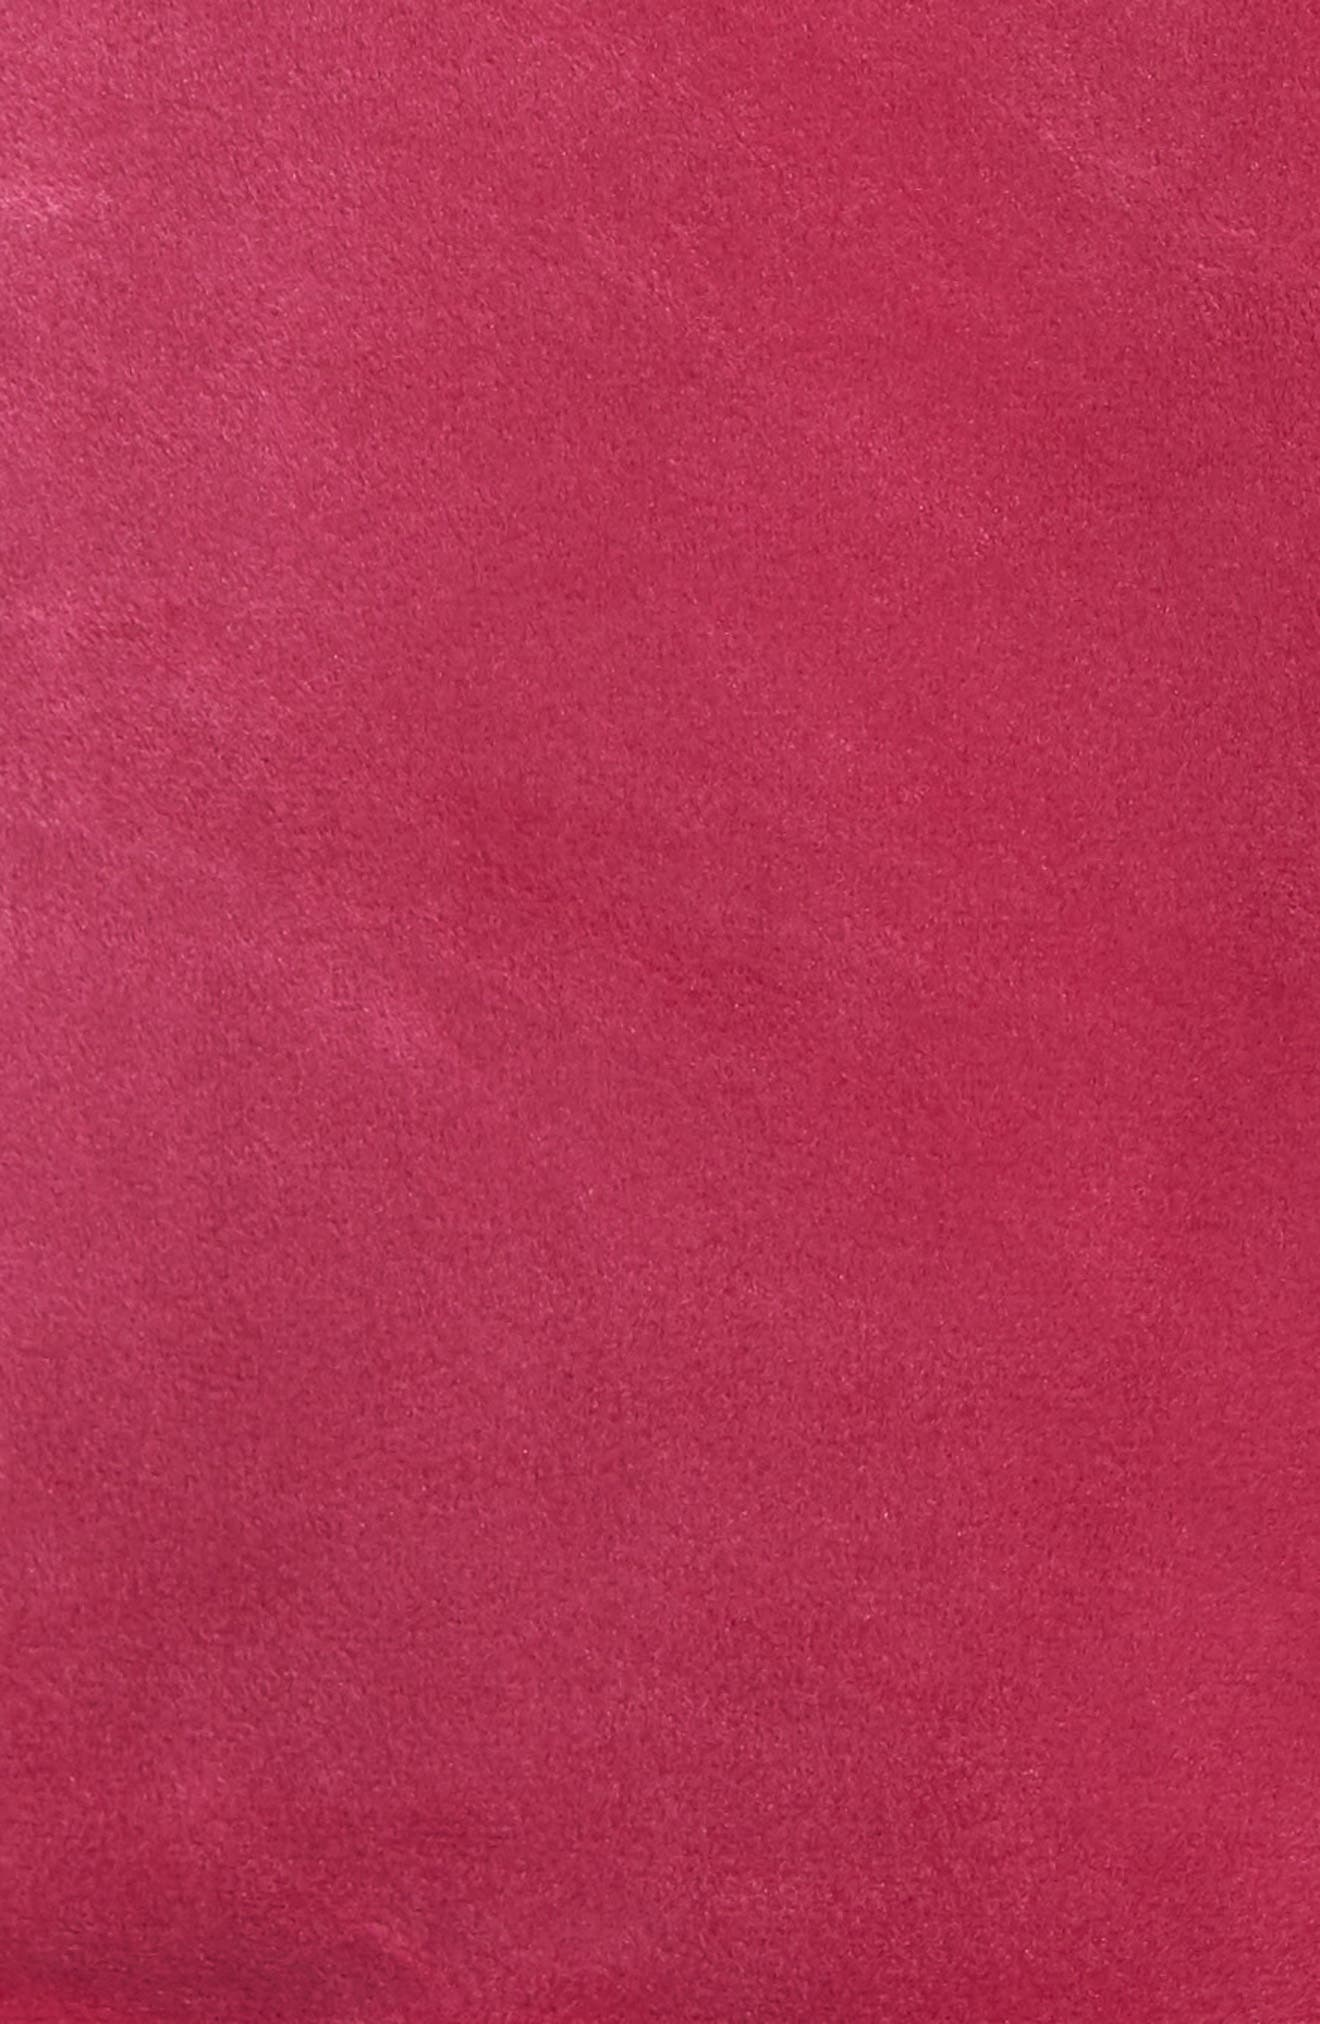 Asher Velour Hoodie Sweatshirt,                             Alternate thumbnail 5, color,                             Rasberry Radiance